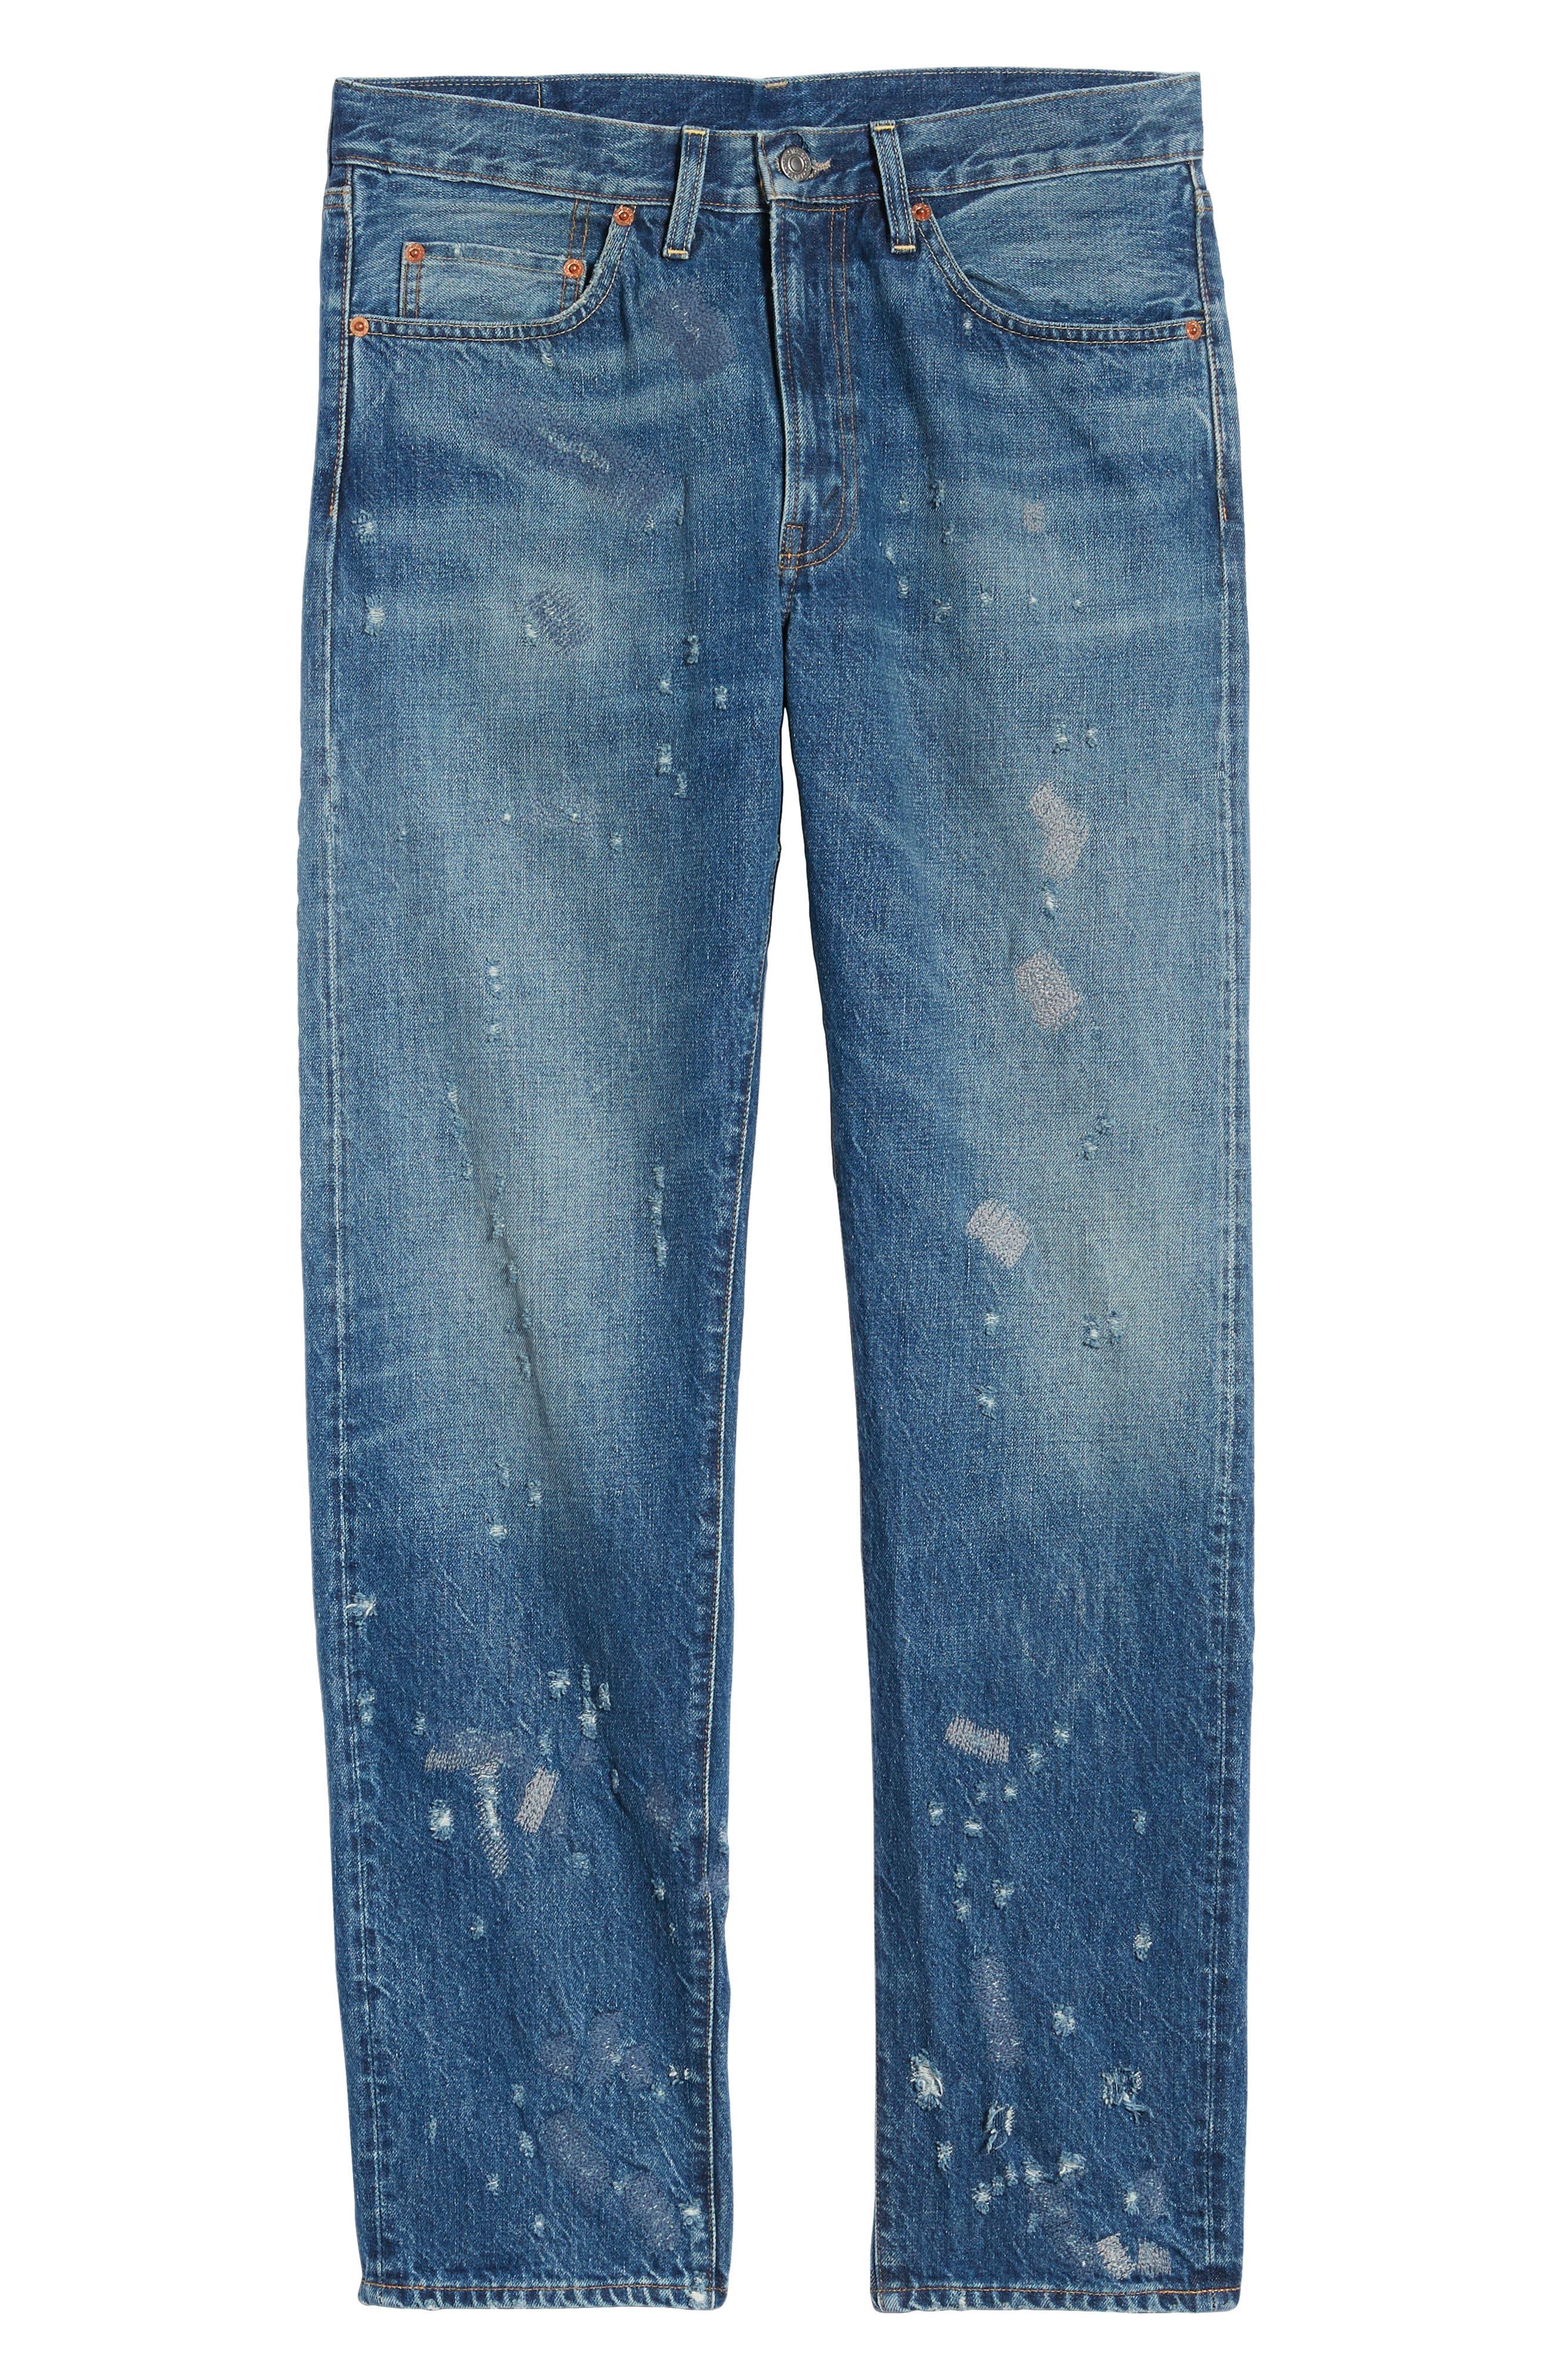 LEVI'S<SUP>®</SUP> VINTAGE CLOTHING, 1954 501<sup>®</sup> Shrink To Fit Straight Leg Jeans, Alternate thumbnail 7, color, BLACKMON